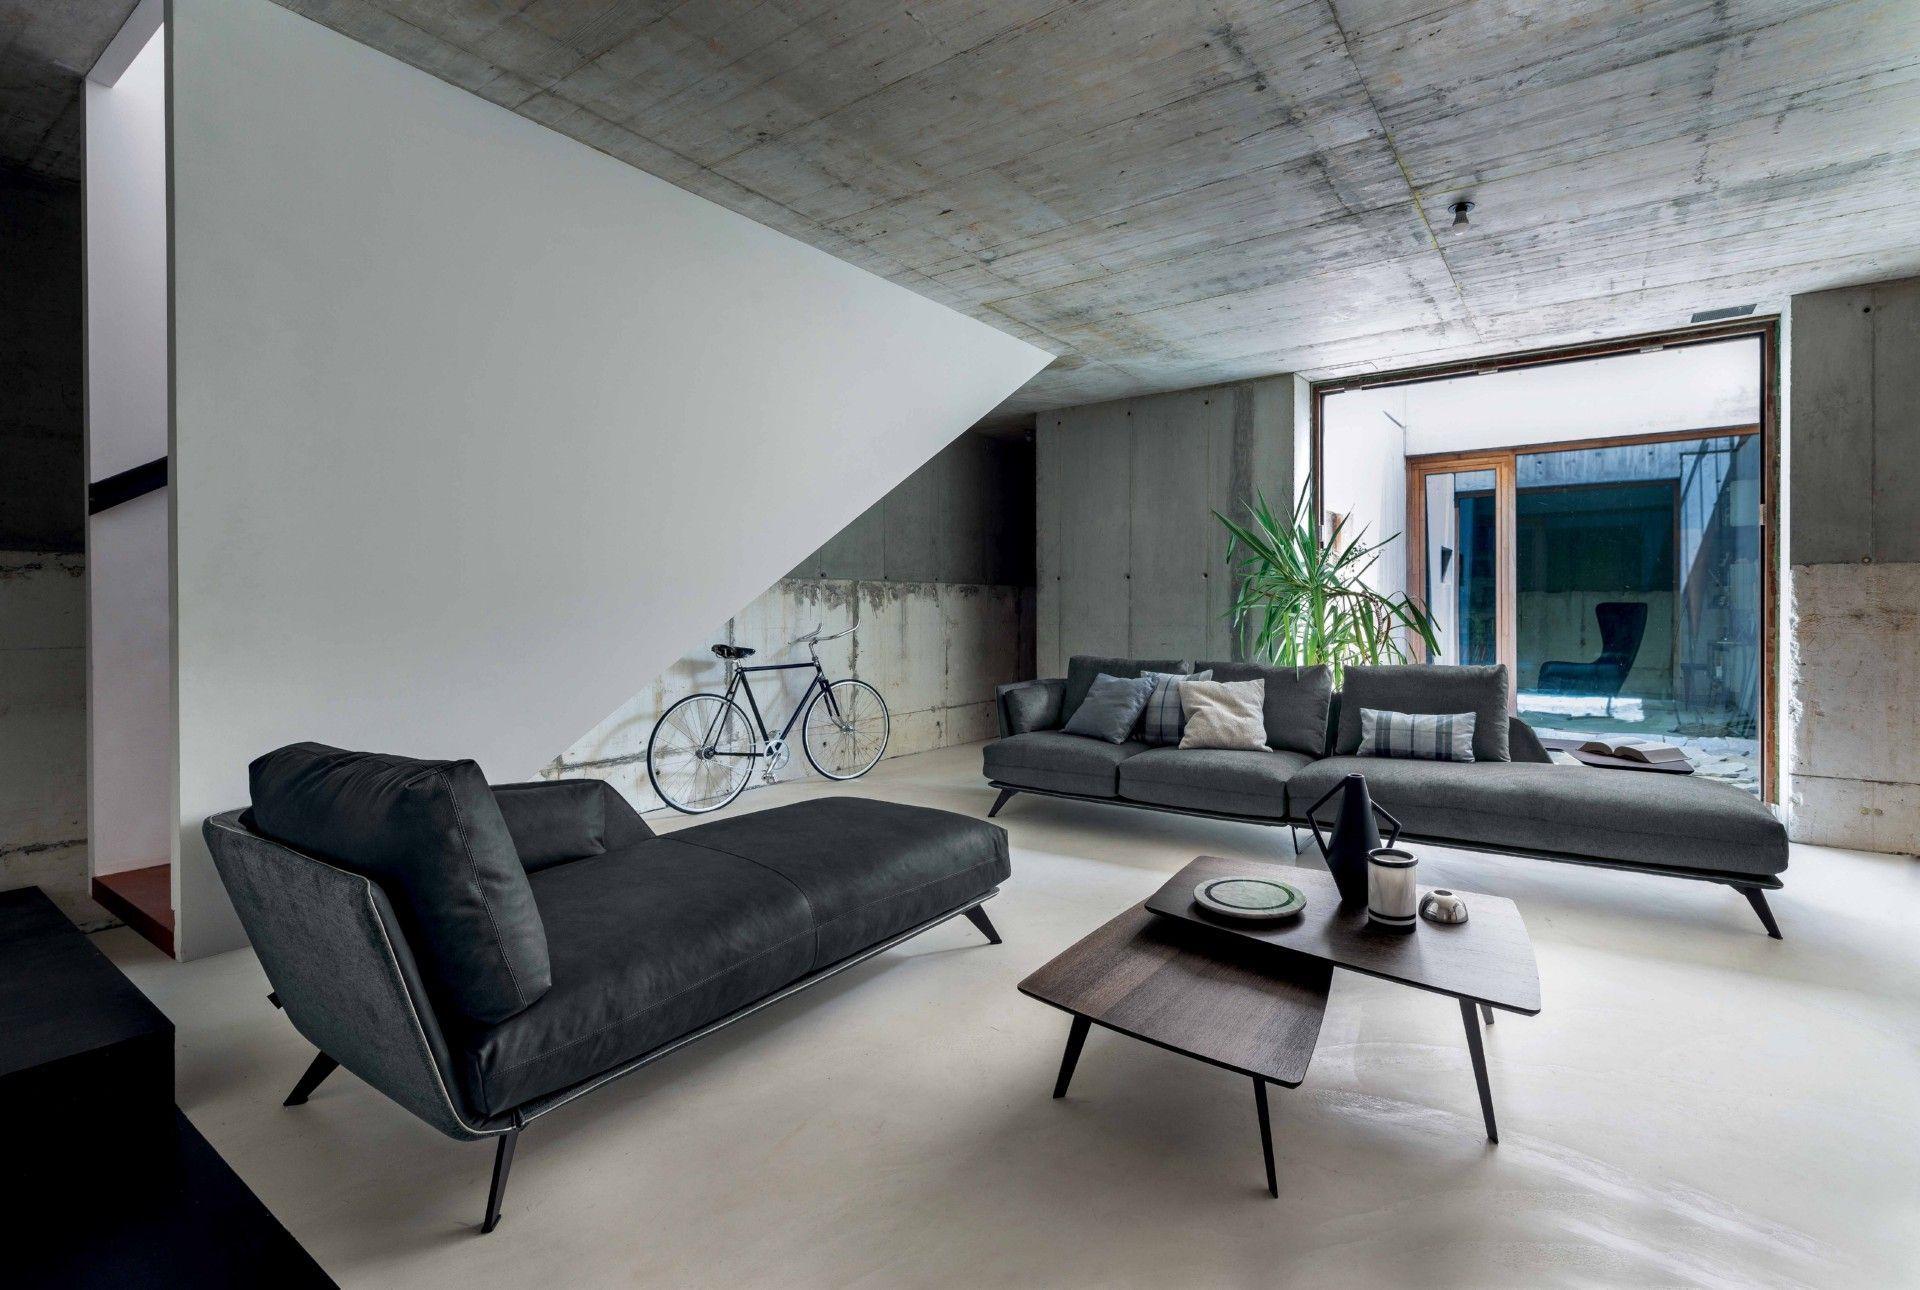 New In Showroom 2 Sofas From Arketipo Sofa Design Bed Design Sofa